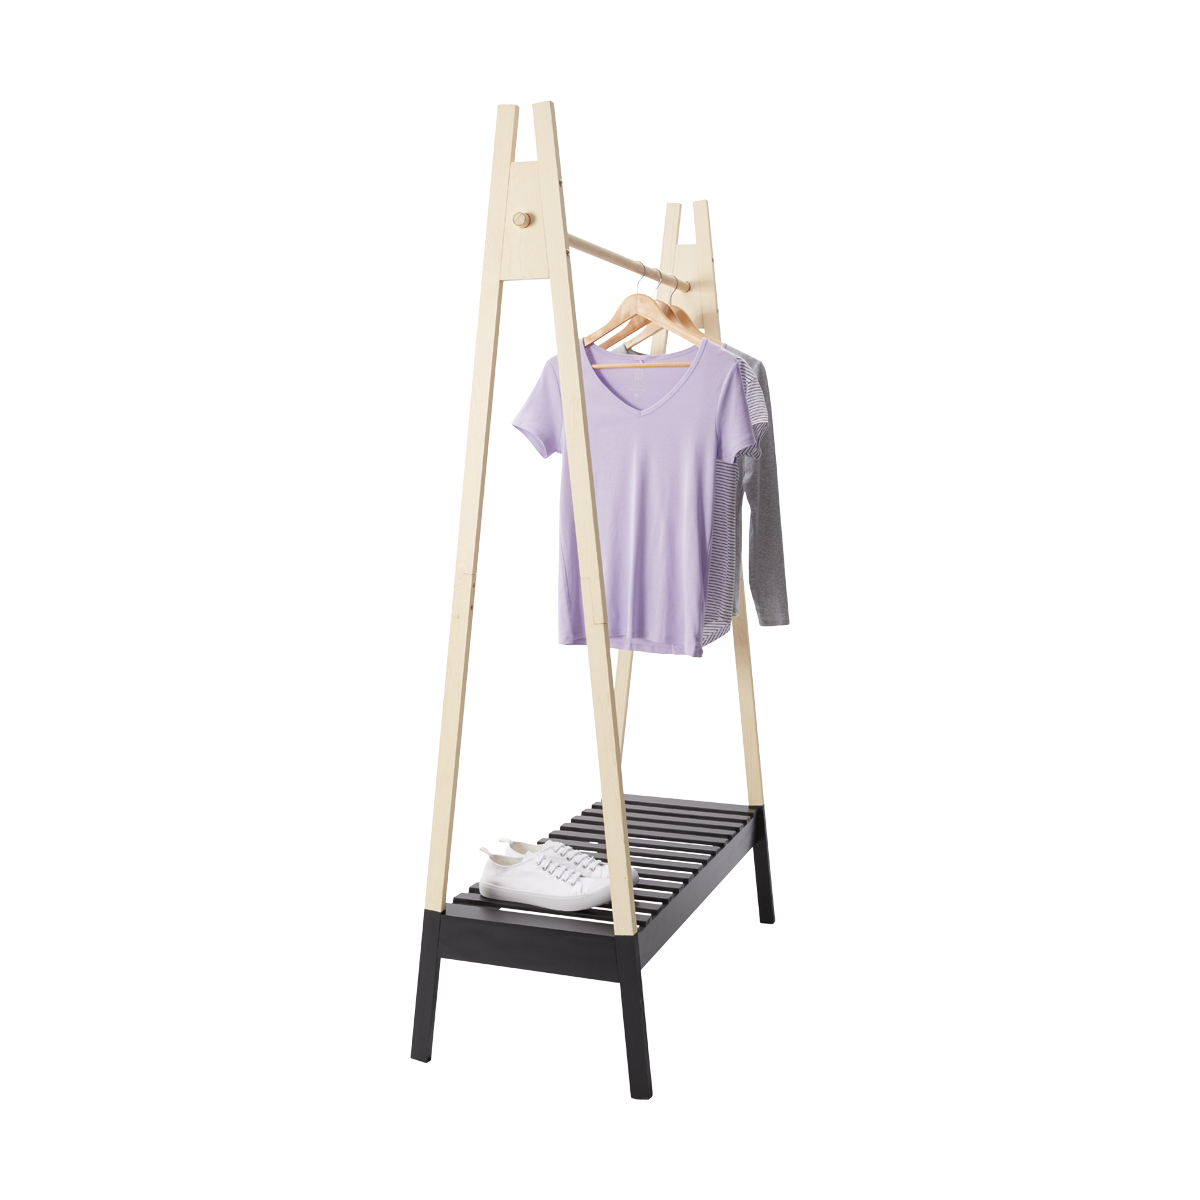 Kmart timber clothes rail